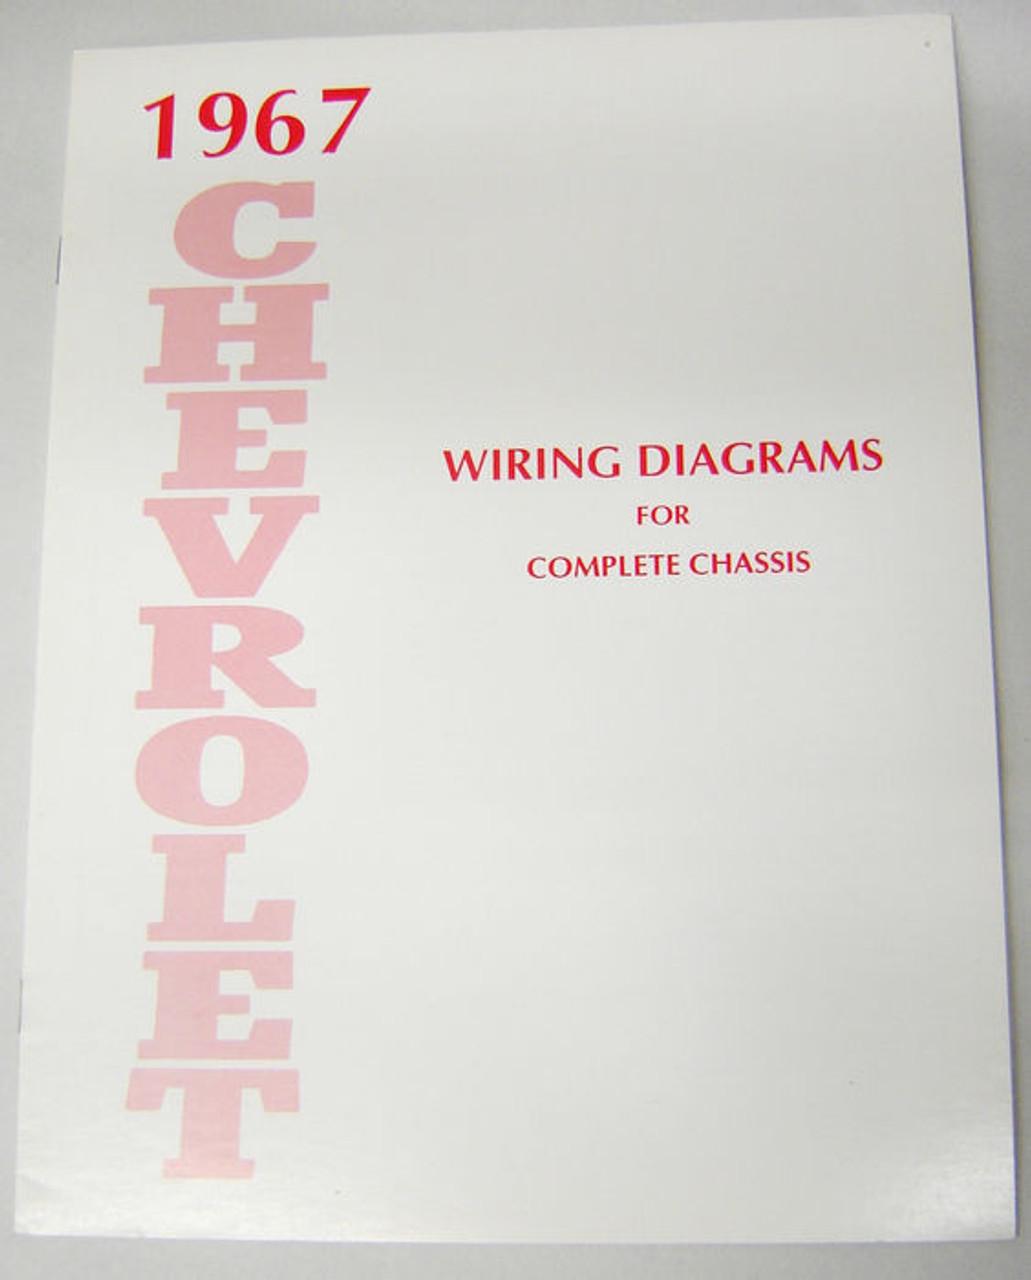 67 1967 Chevy Impala Electrical Wiring Diagram Manual - I-5 Classic ChevyI-5 Classic Chevy